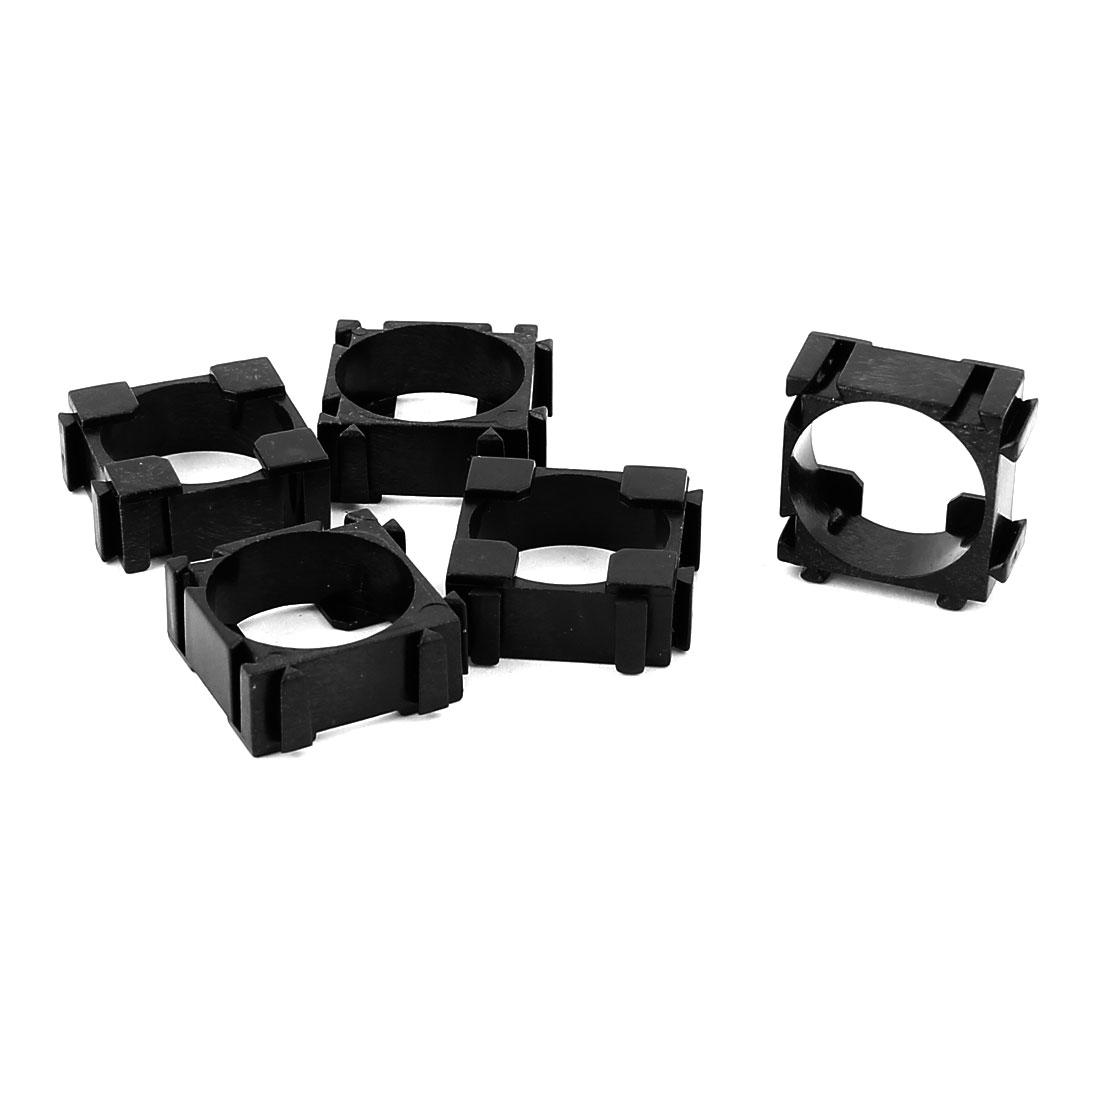 5 Pcs 18650 Lithium Ion Cell Battery Holder Bracket for DIY Battery Pack